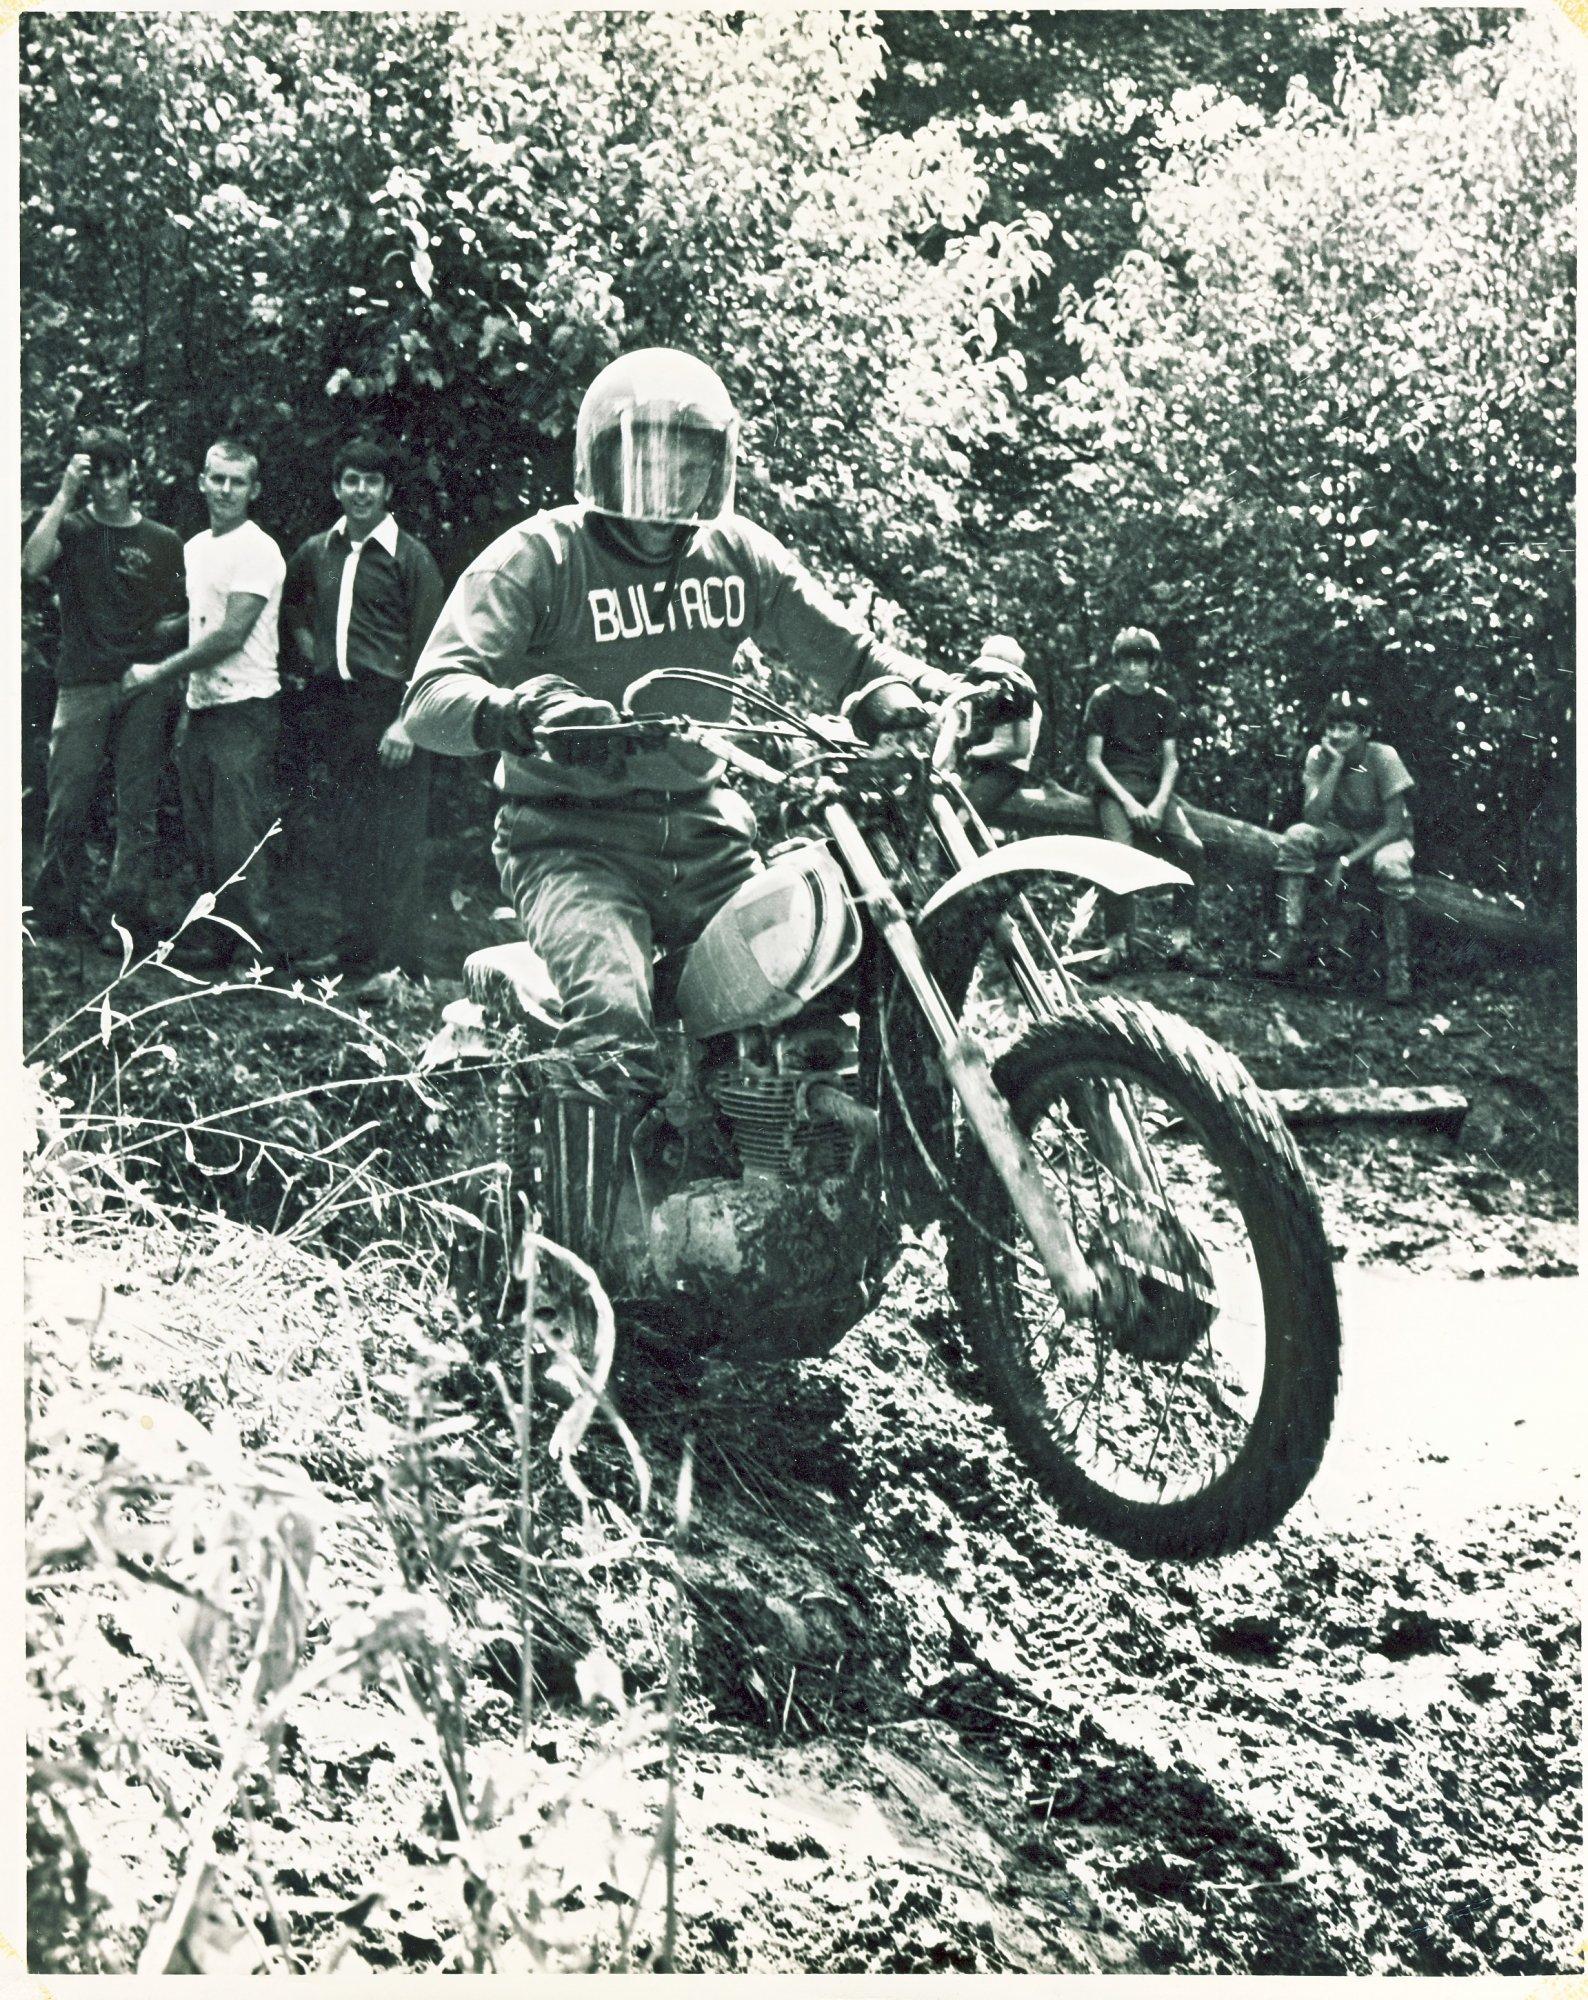 Bultaco Opa.jpg